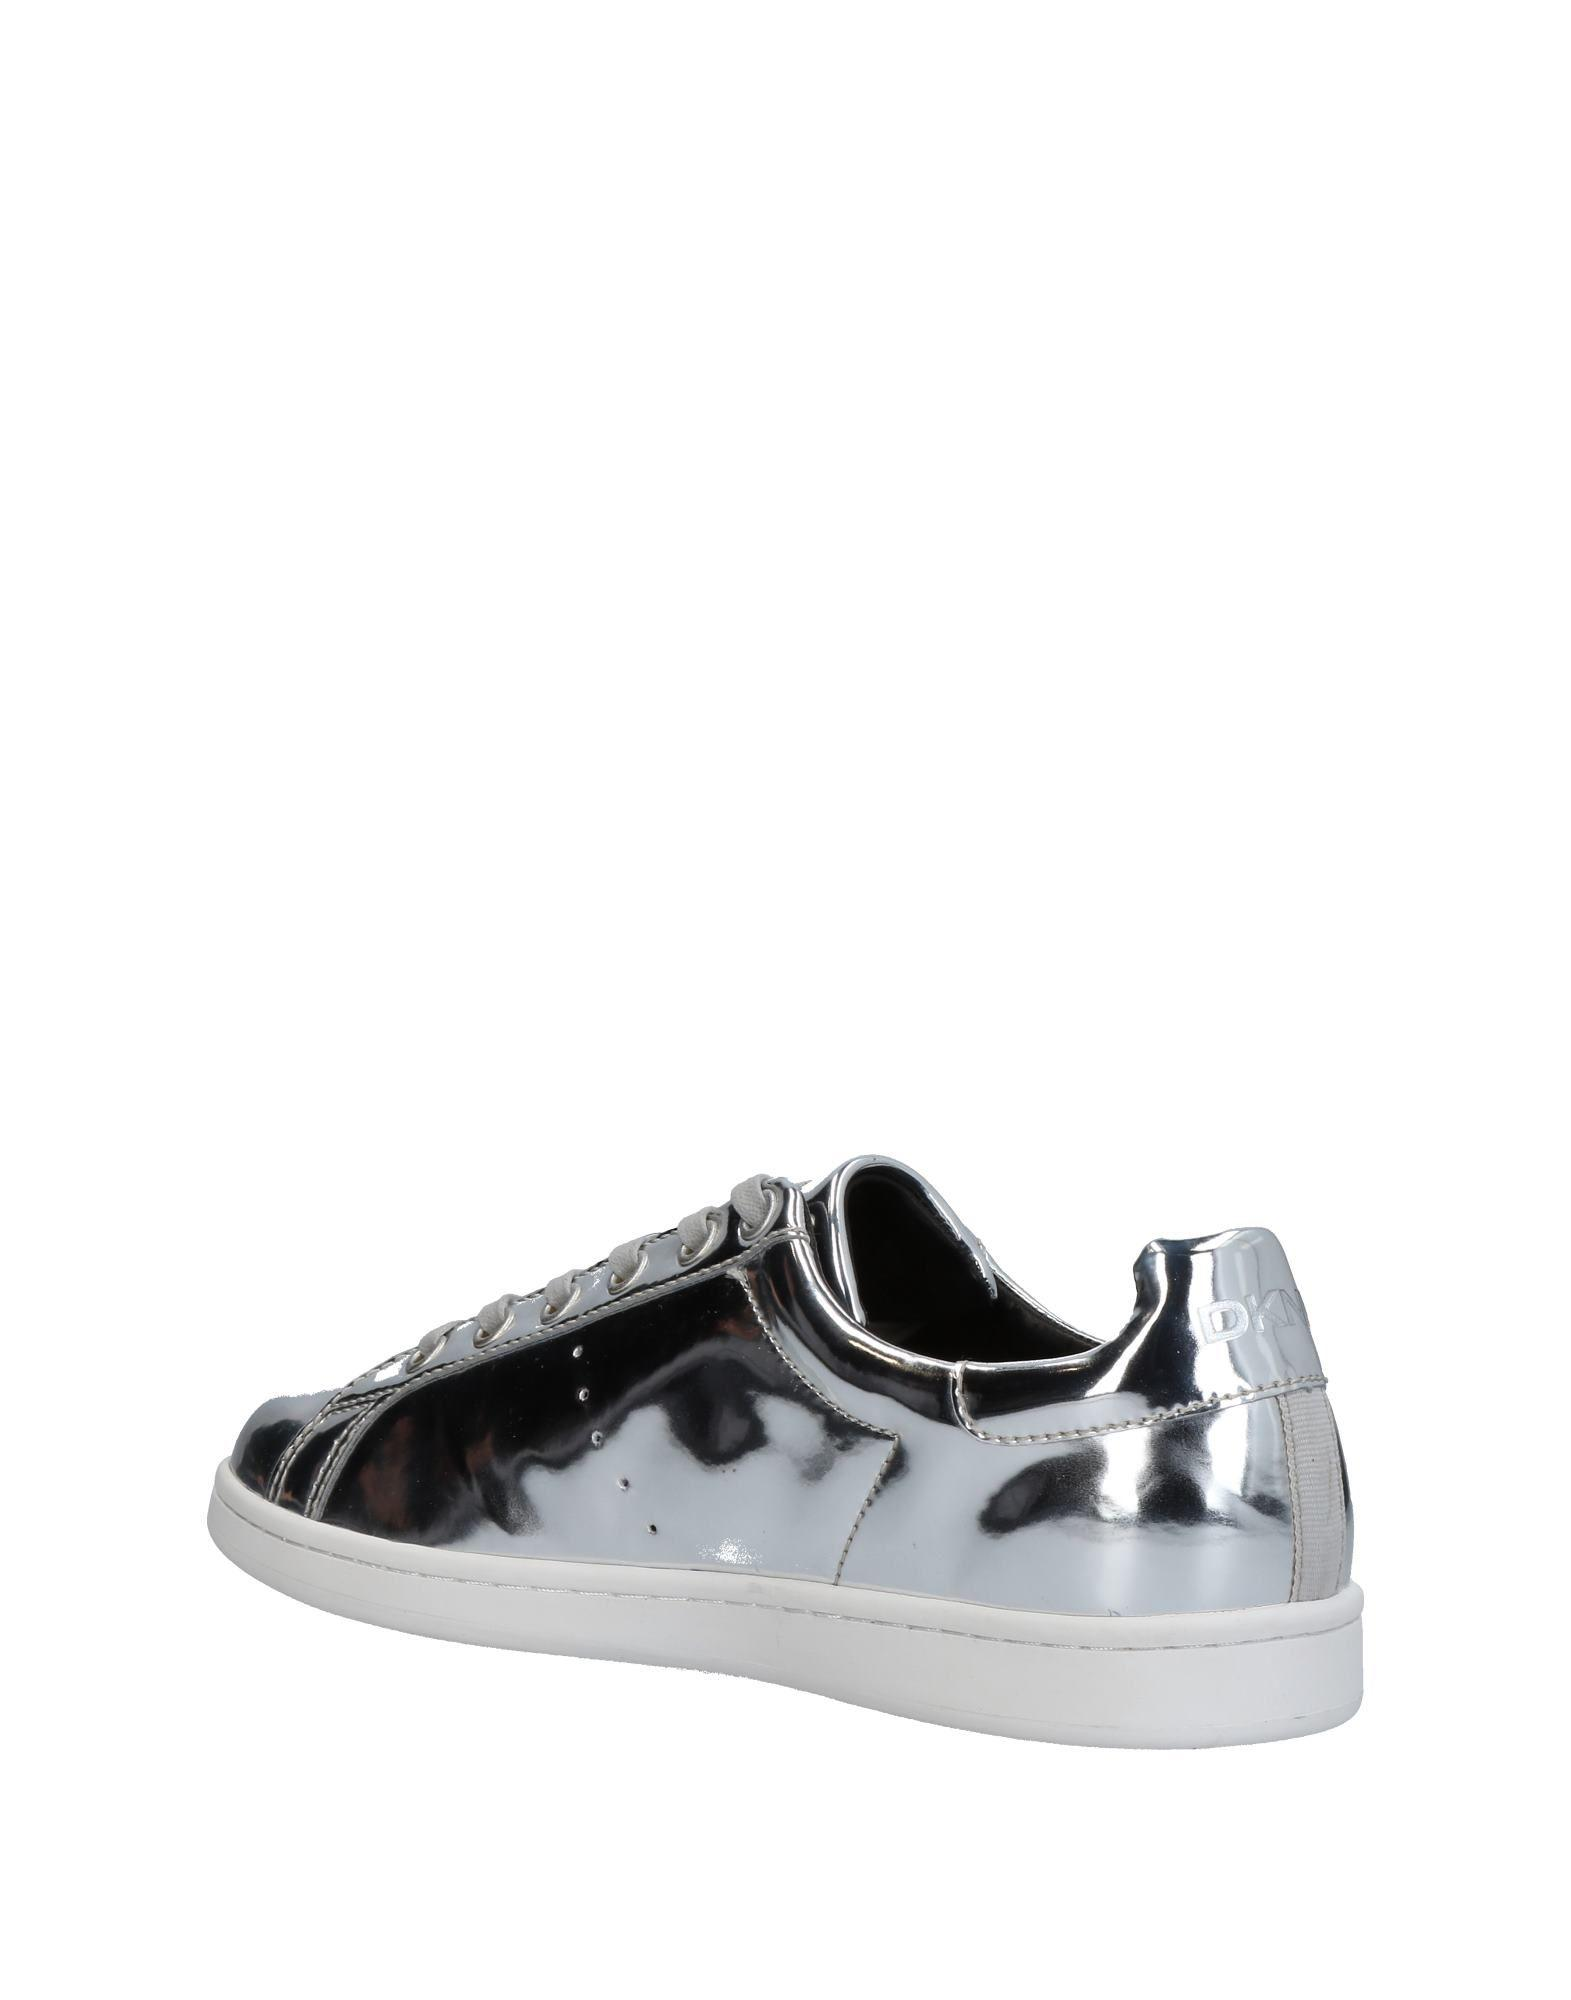 DKNY Low-tops & Sneakers in Silver (Metallic)